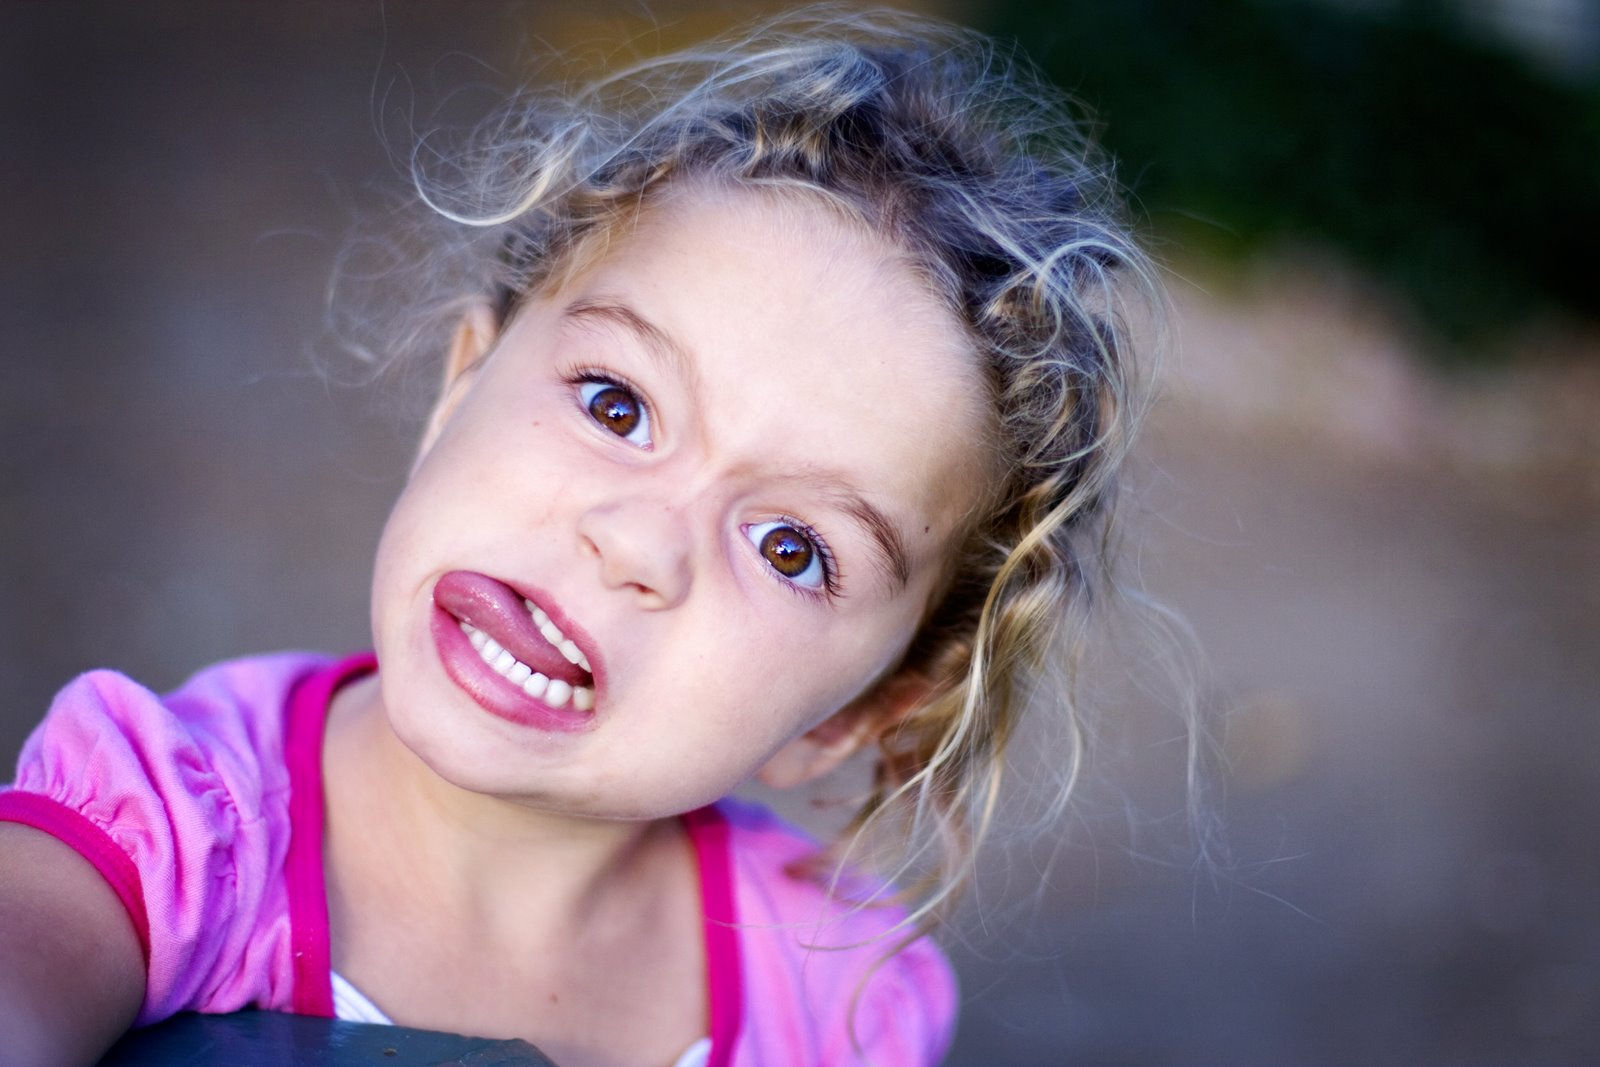 Gambar Anak Kecil Senyum Lucu